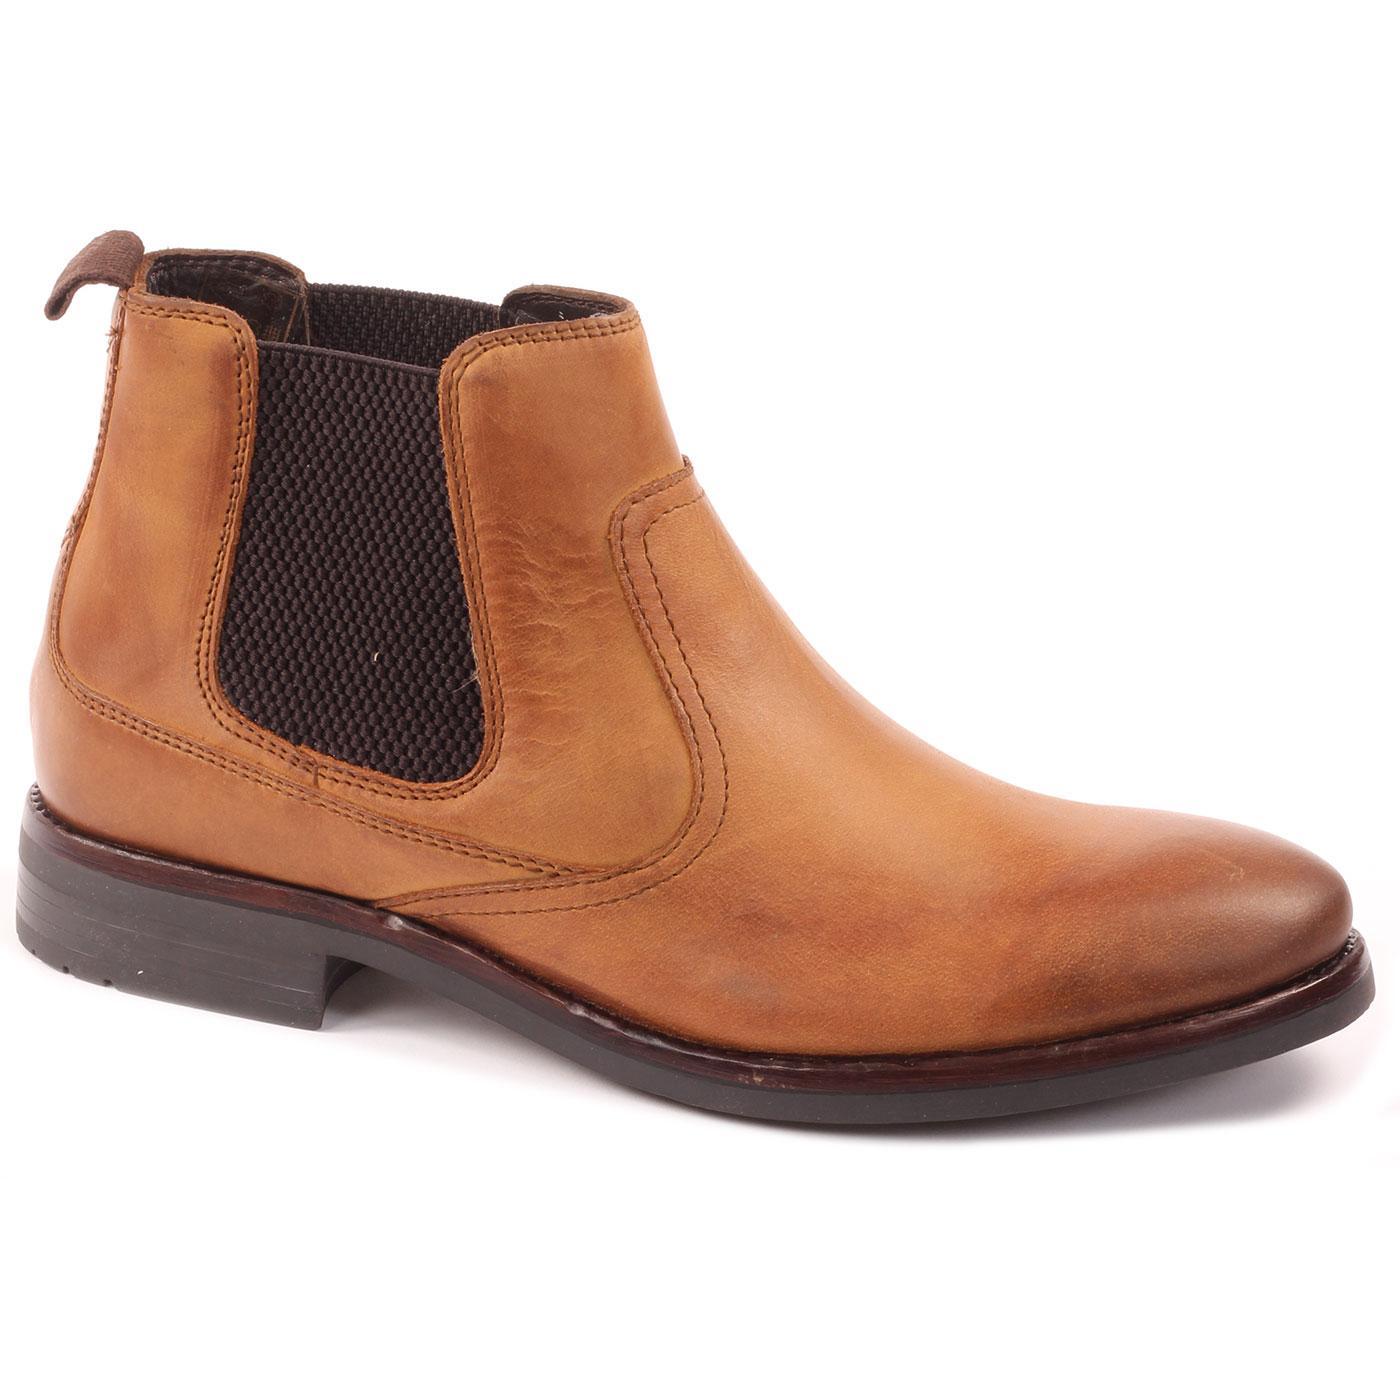 Clayton IKON Men's Retro Mod Chelsea Boots (Tan)